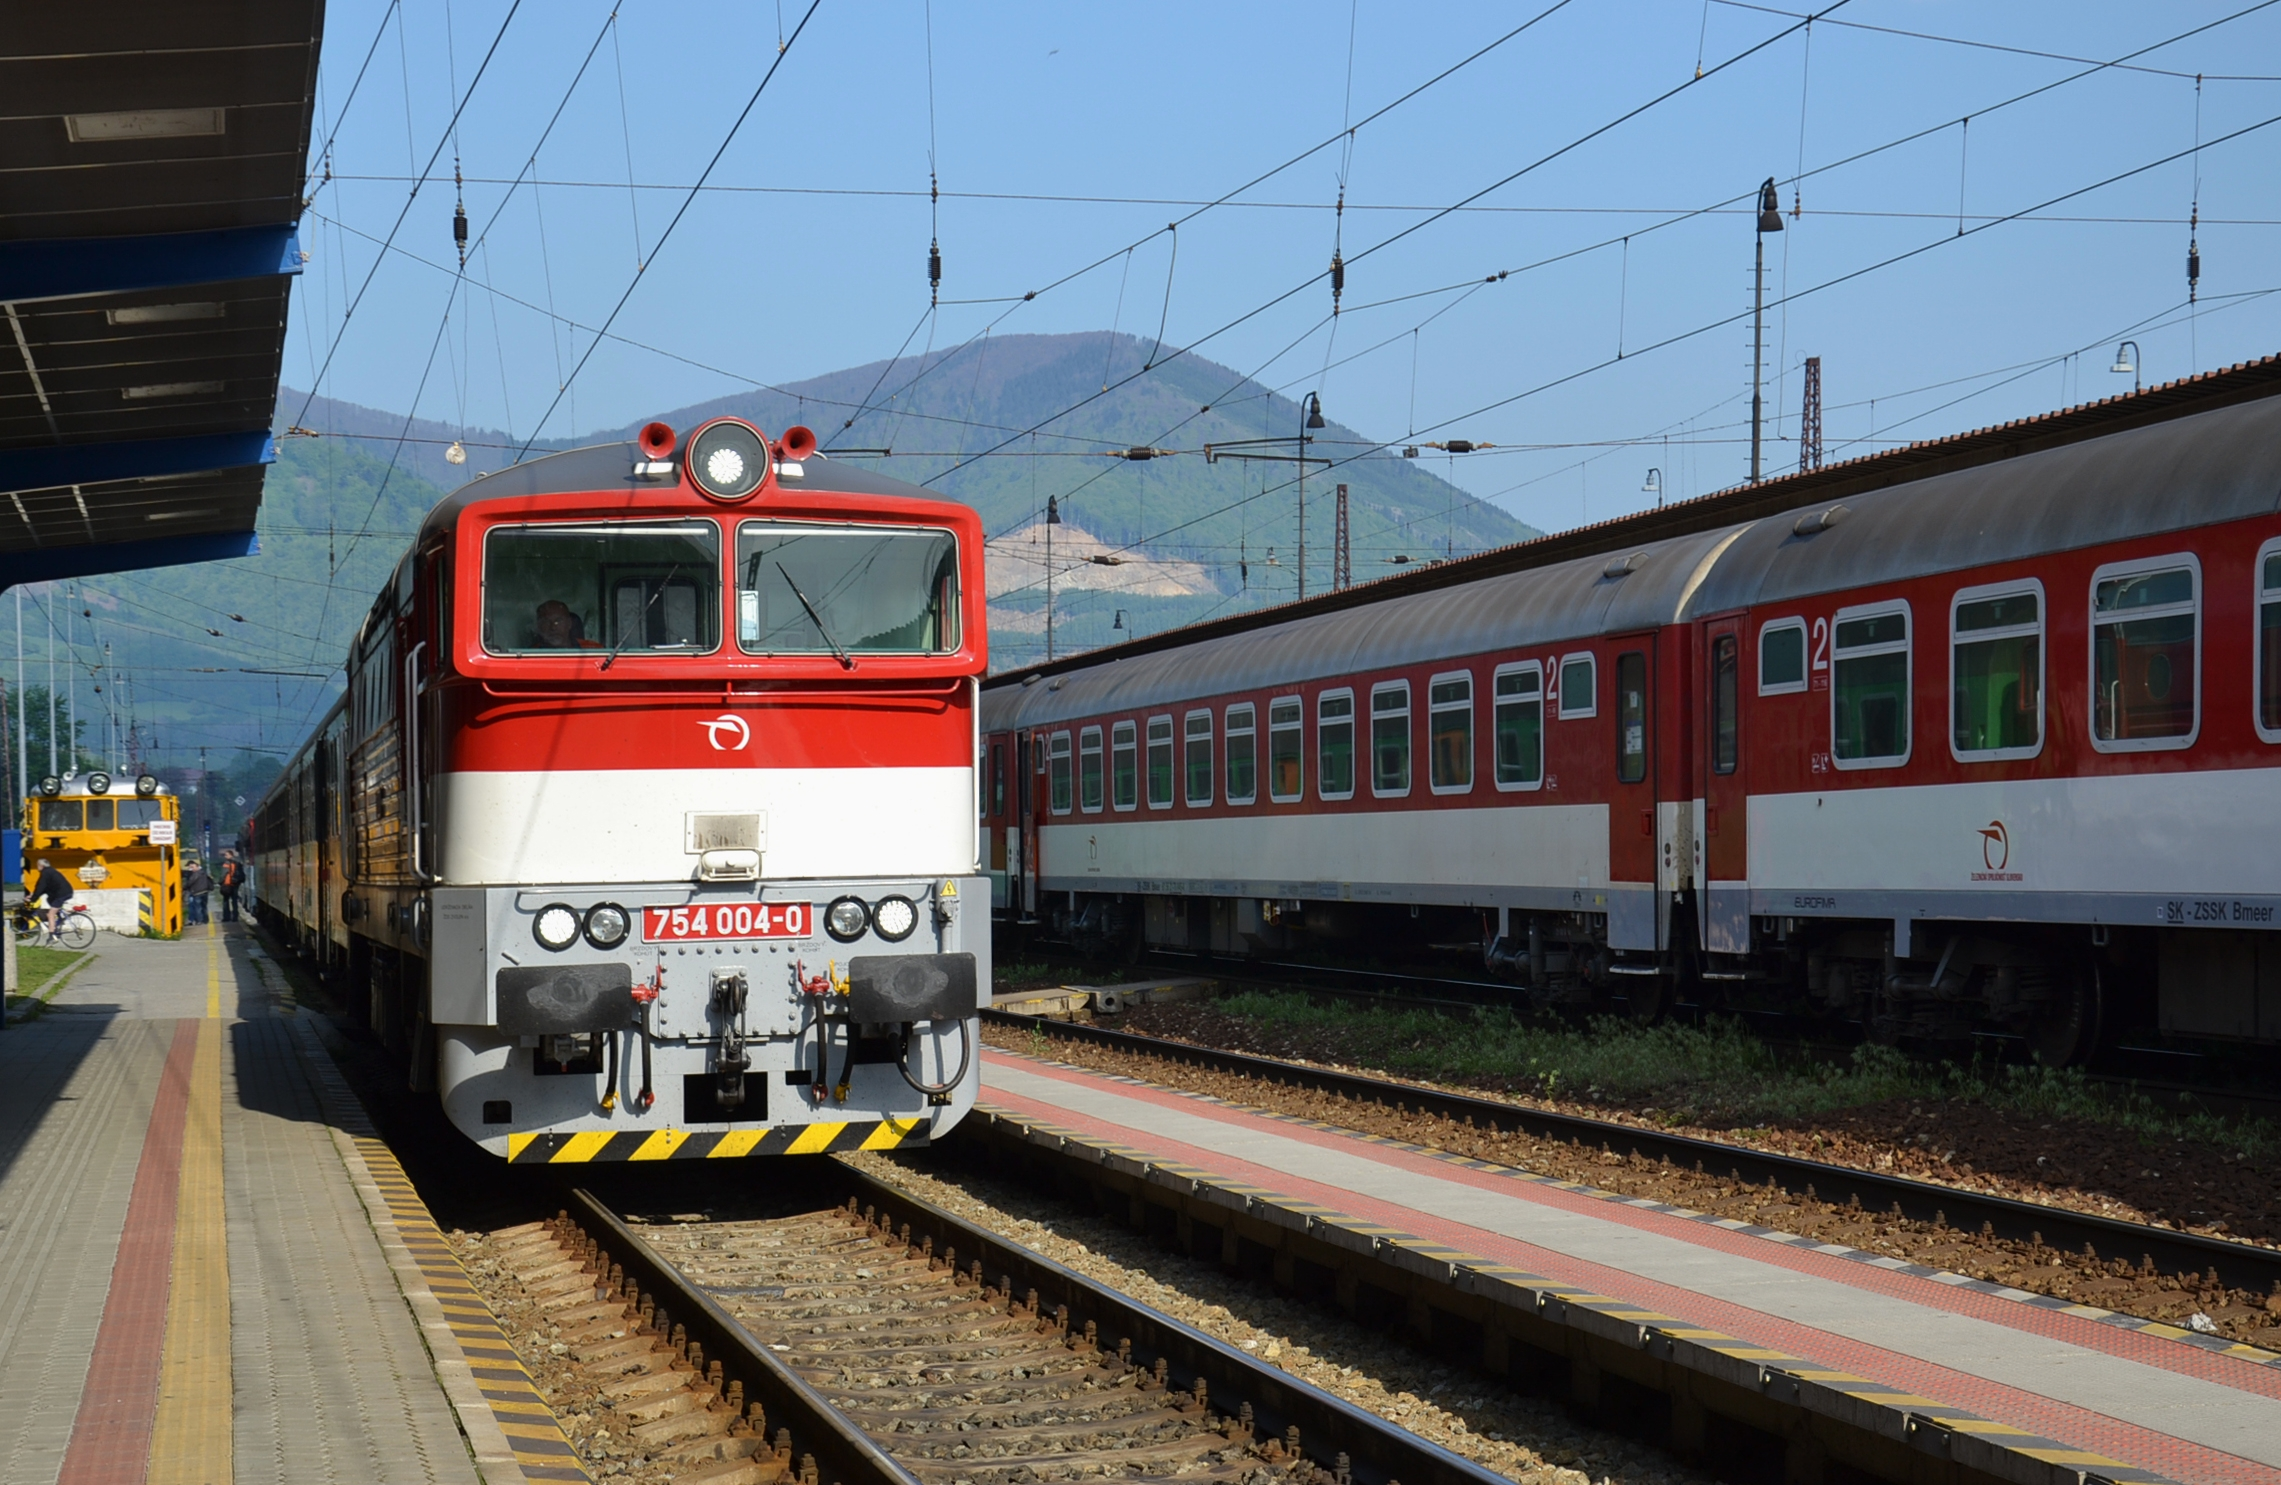 File:Lokomotiva 754-004 - Vrútky.JPG